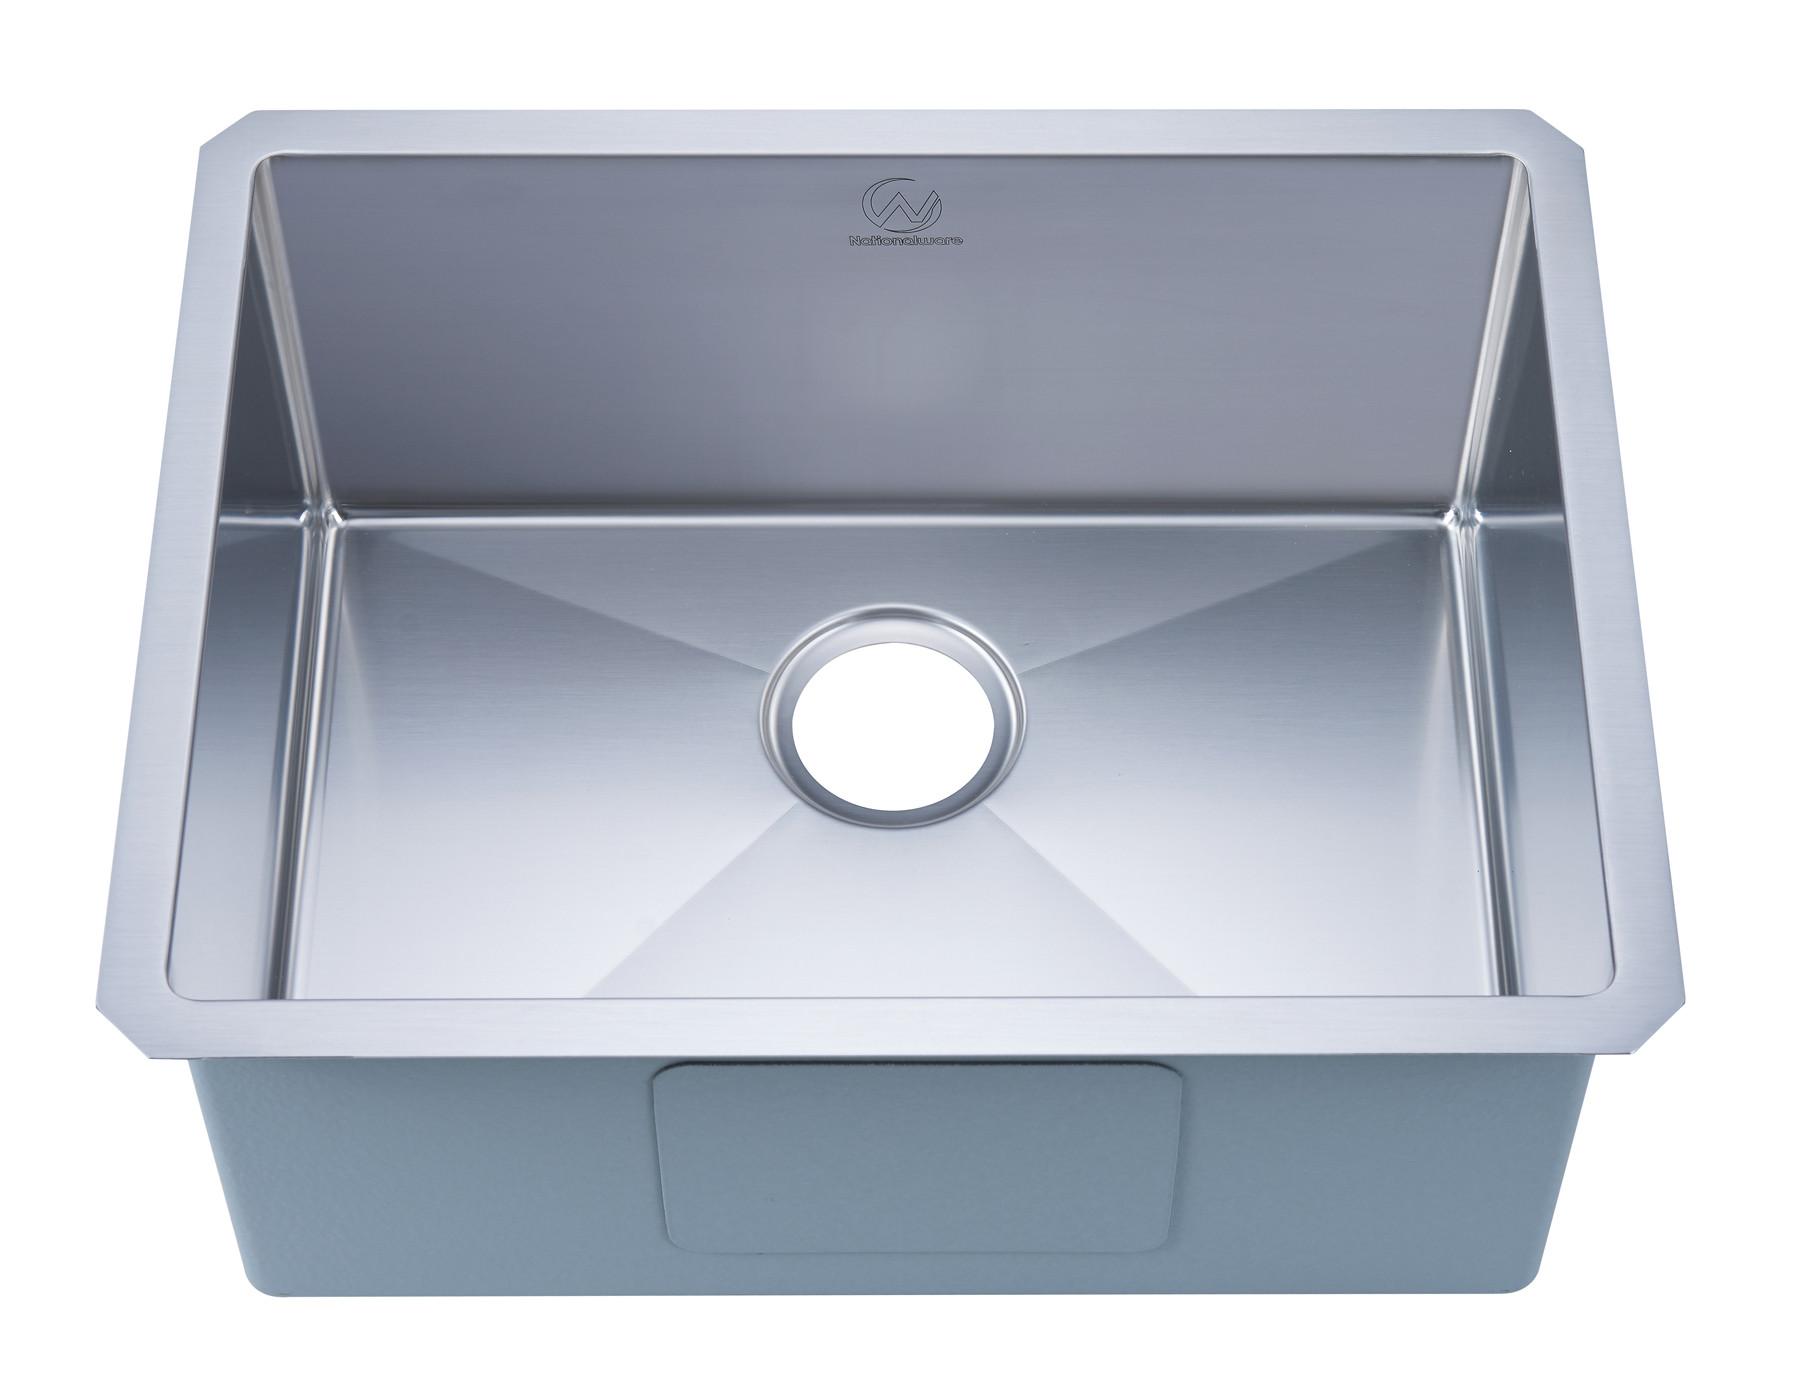 Stufurhome NW-2318S Undermount Stainless Steel 23 Inch Single Bowl Kitchen Sink